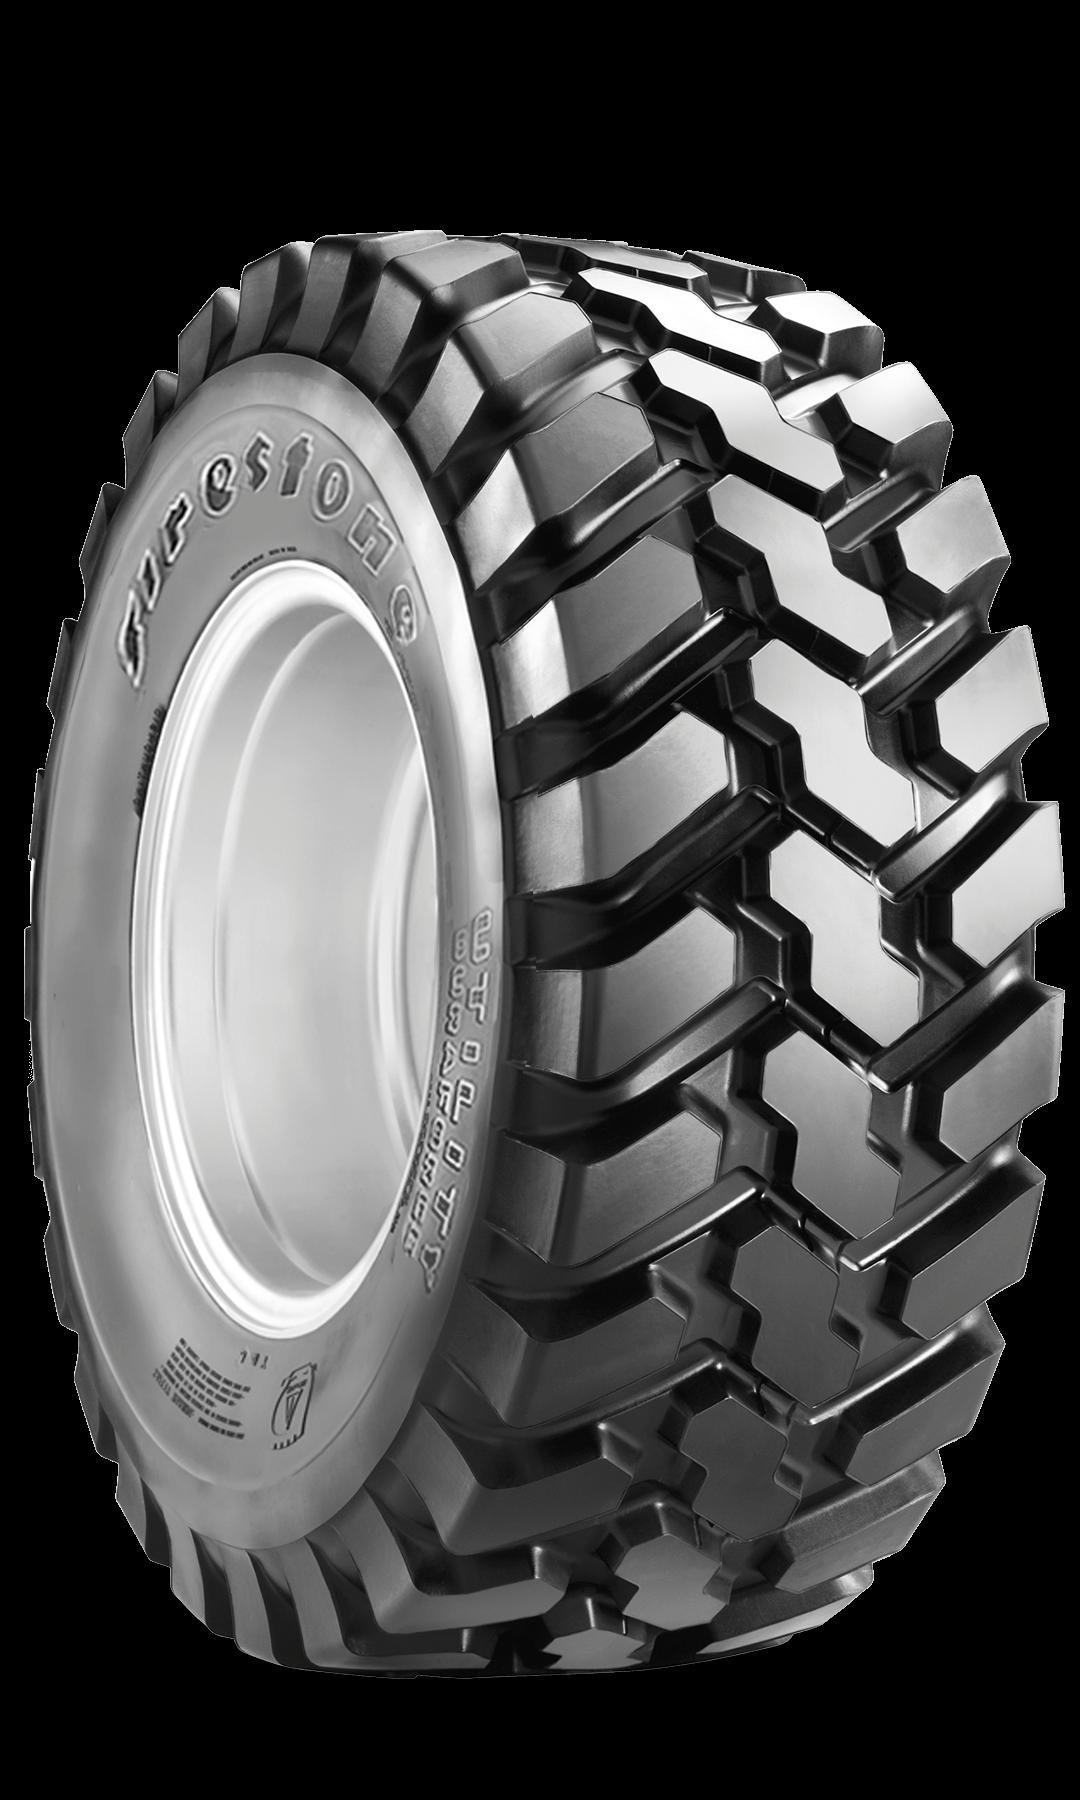 Loader Tires - Heavy Equipment & Construction Tires ...